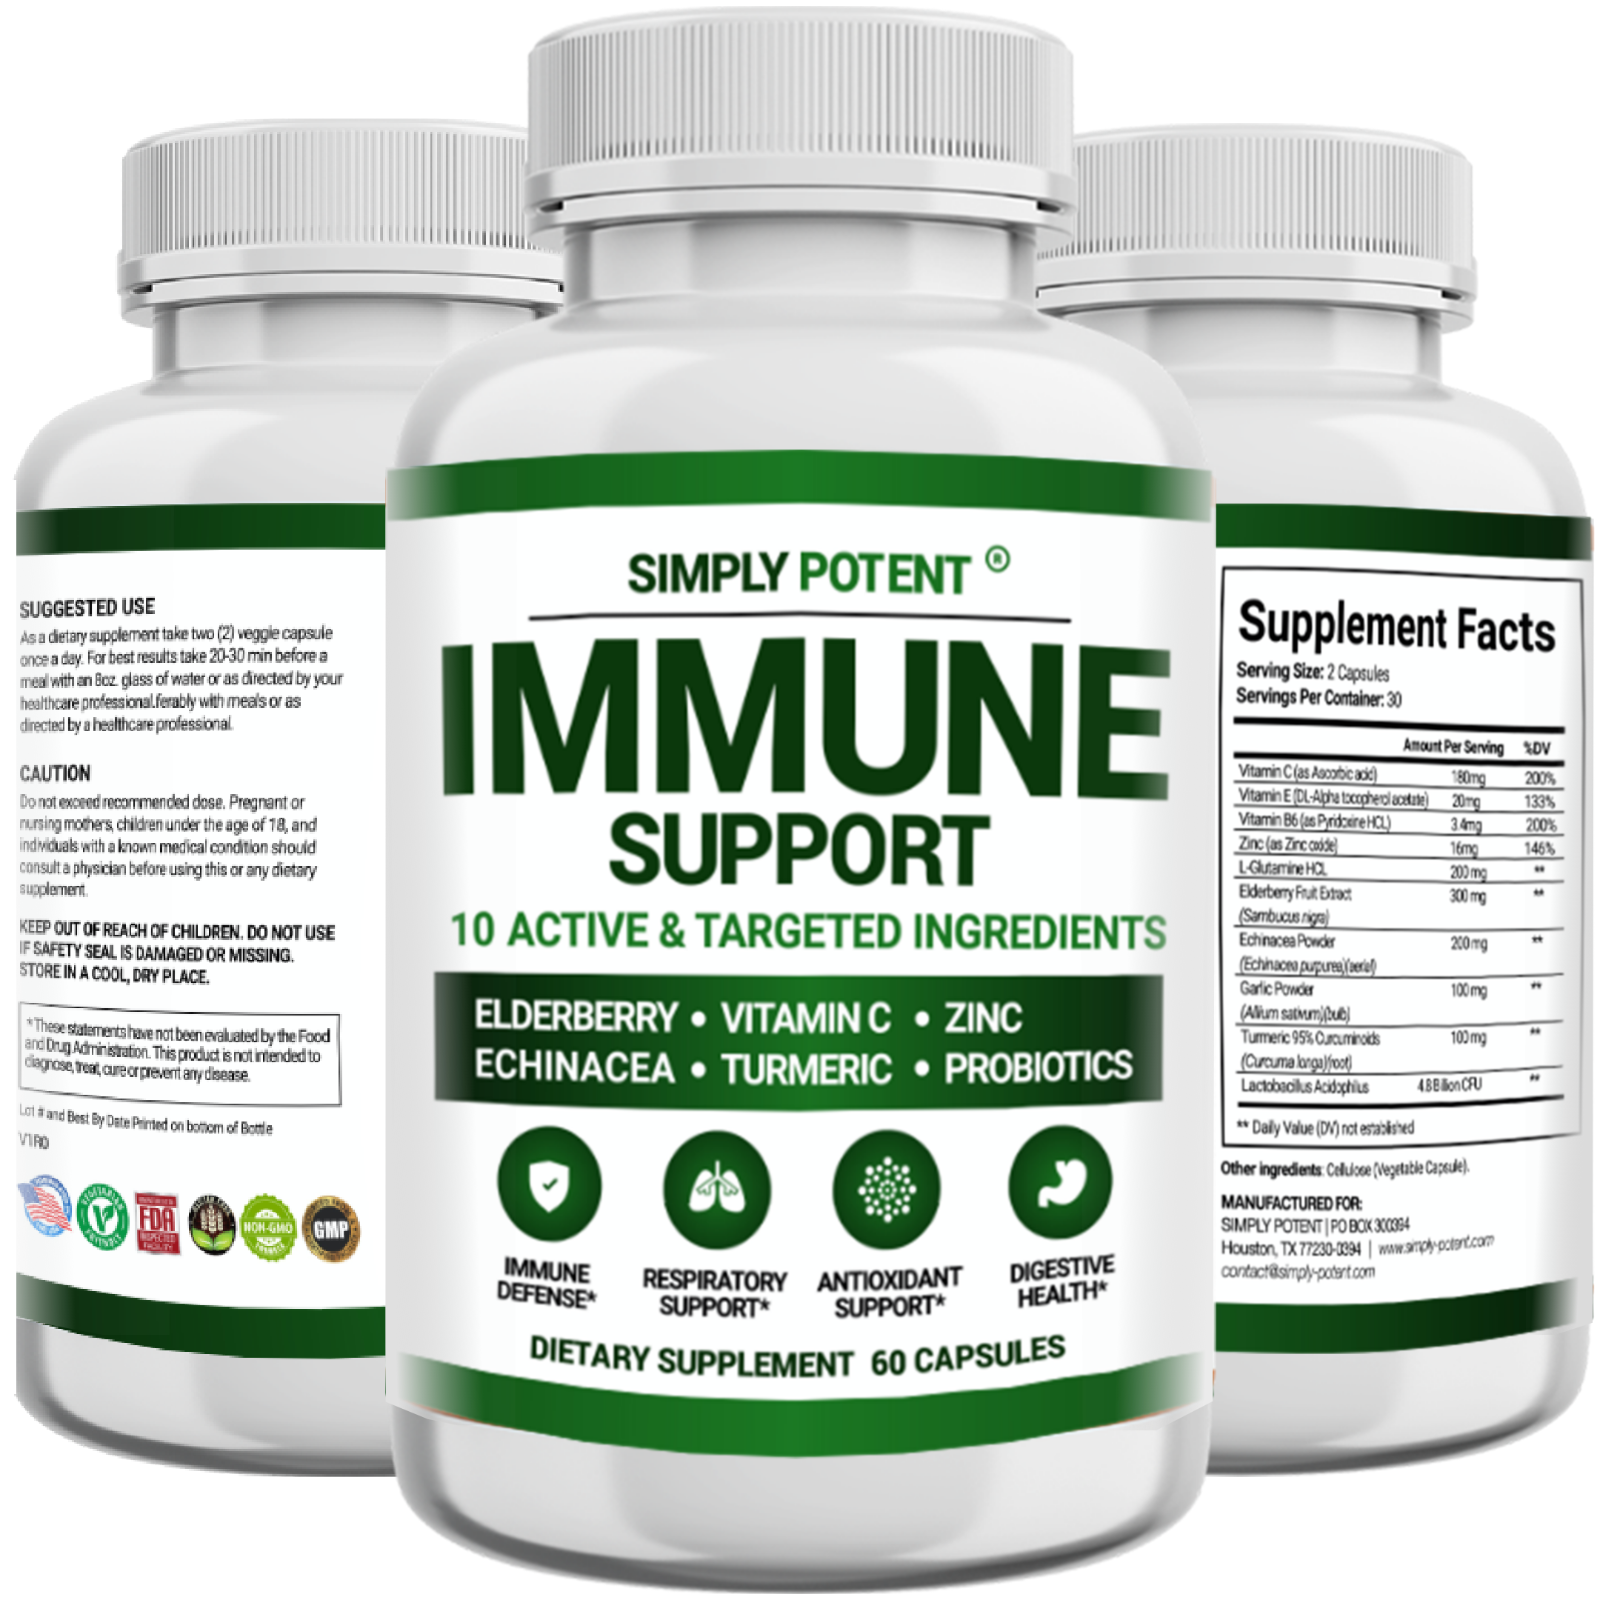 Immune Support & Immunity Booster w Elderberry Vitamin C Zinc Echinacea Turmeric 8